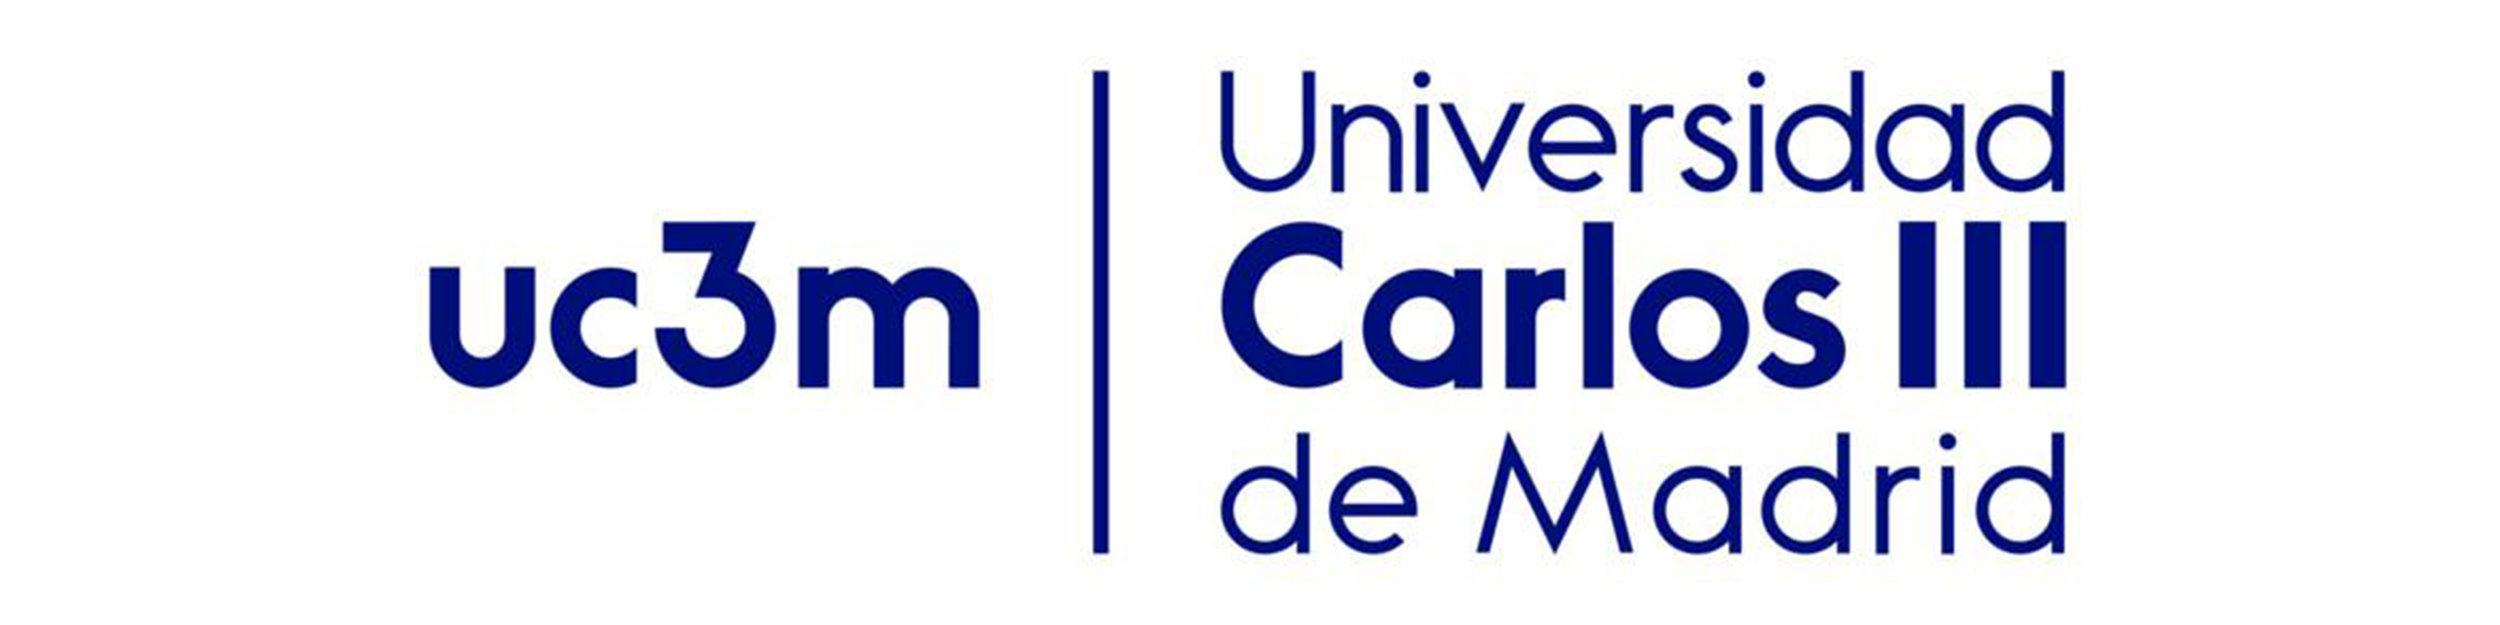 logo-uc3m-2.jpg